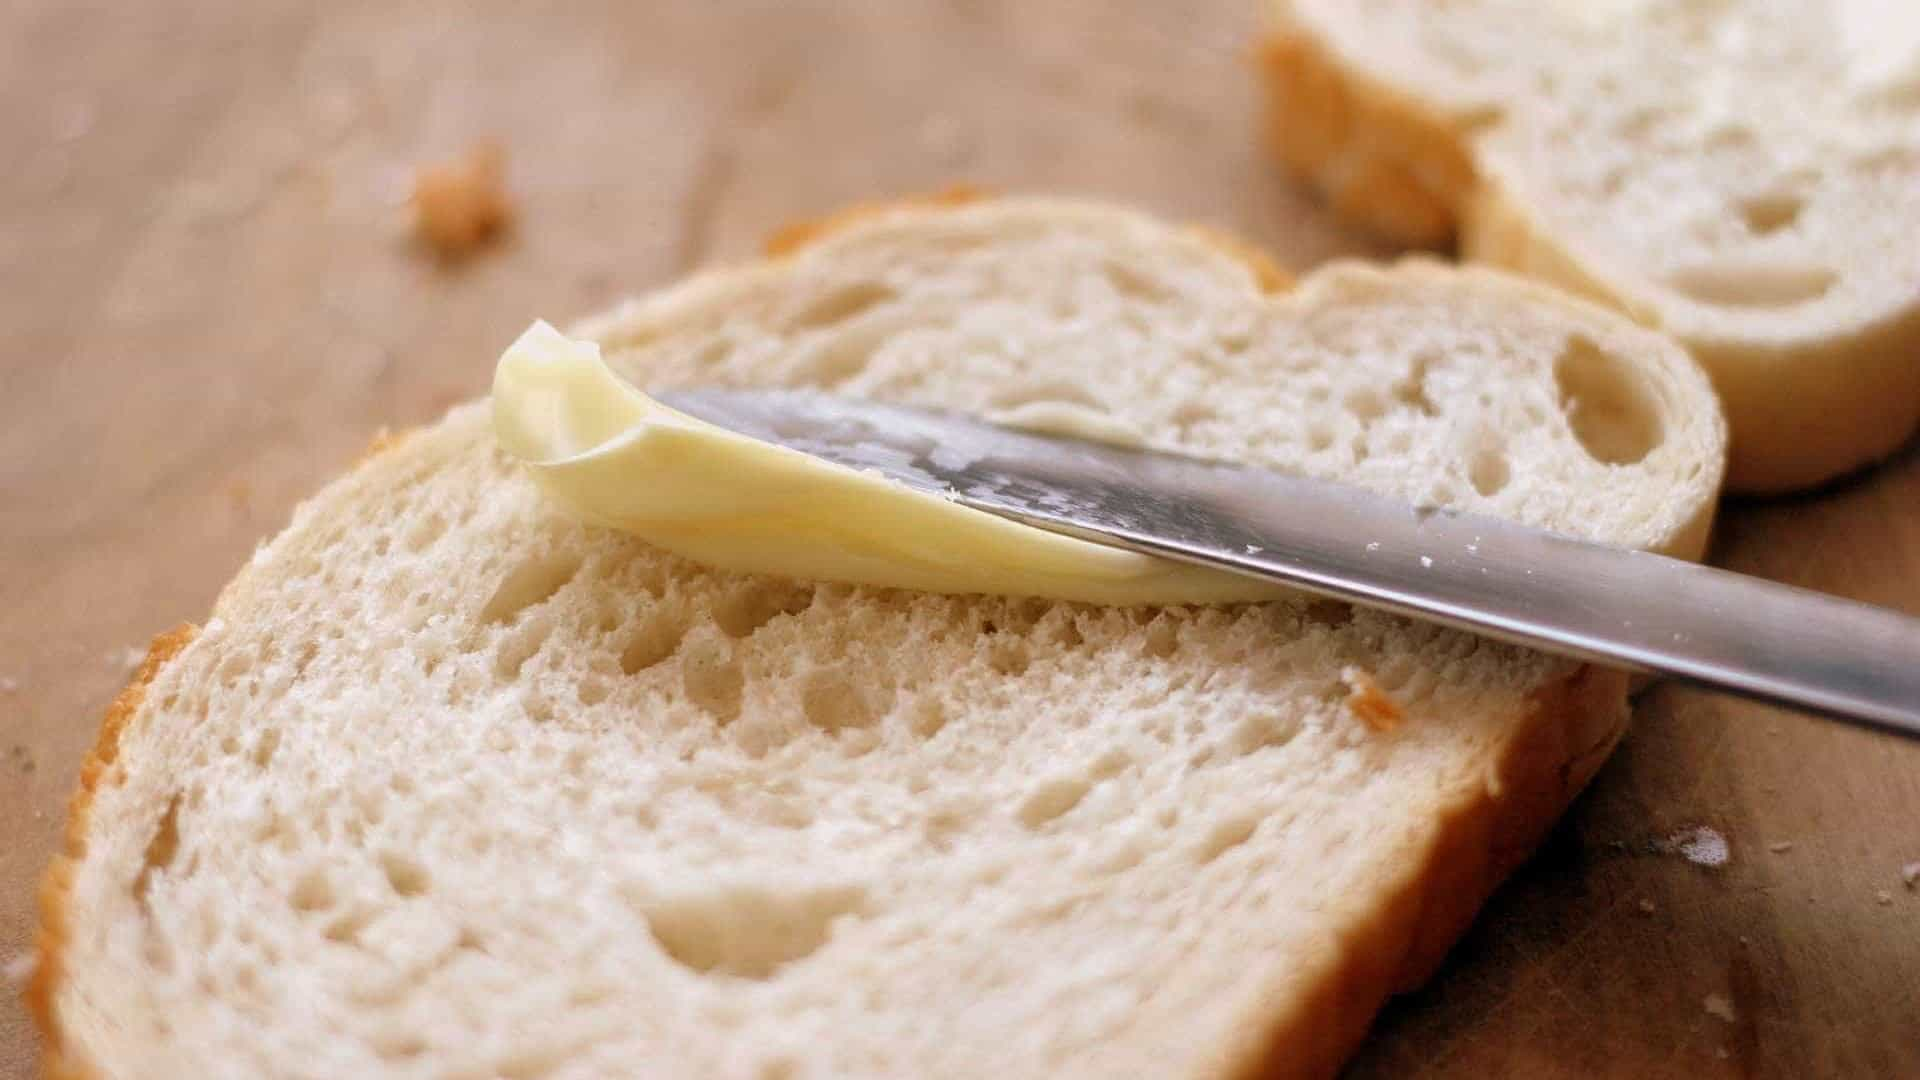 Embalagem de margarina terá de informar porcentual de gordura